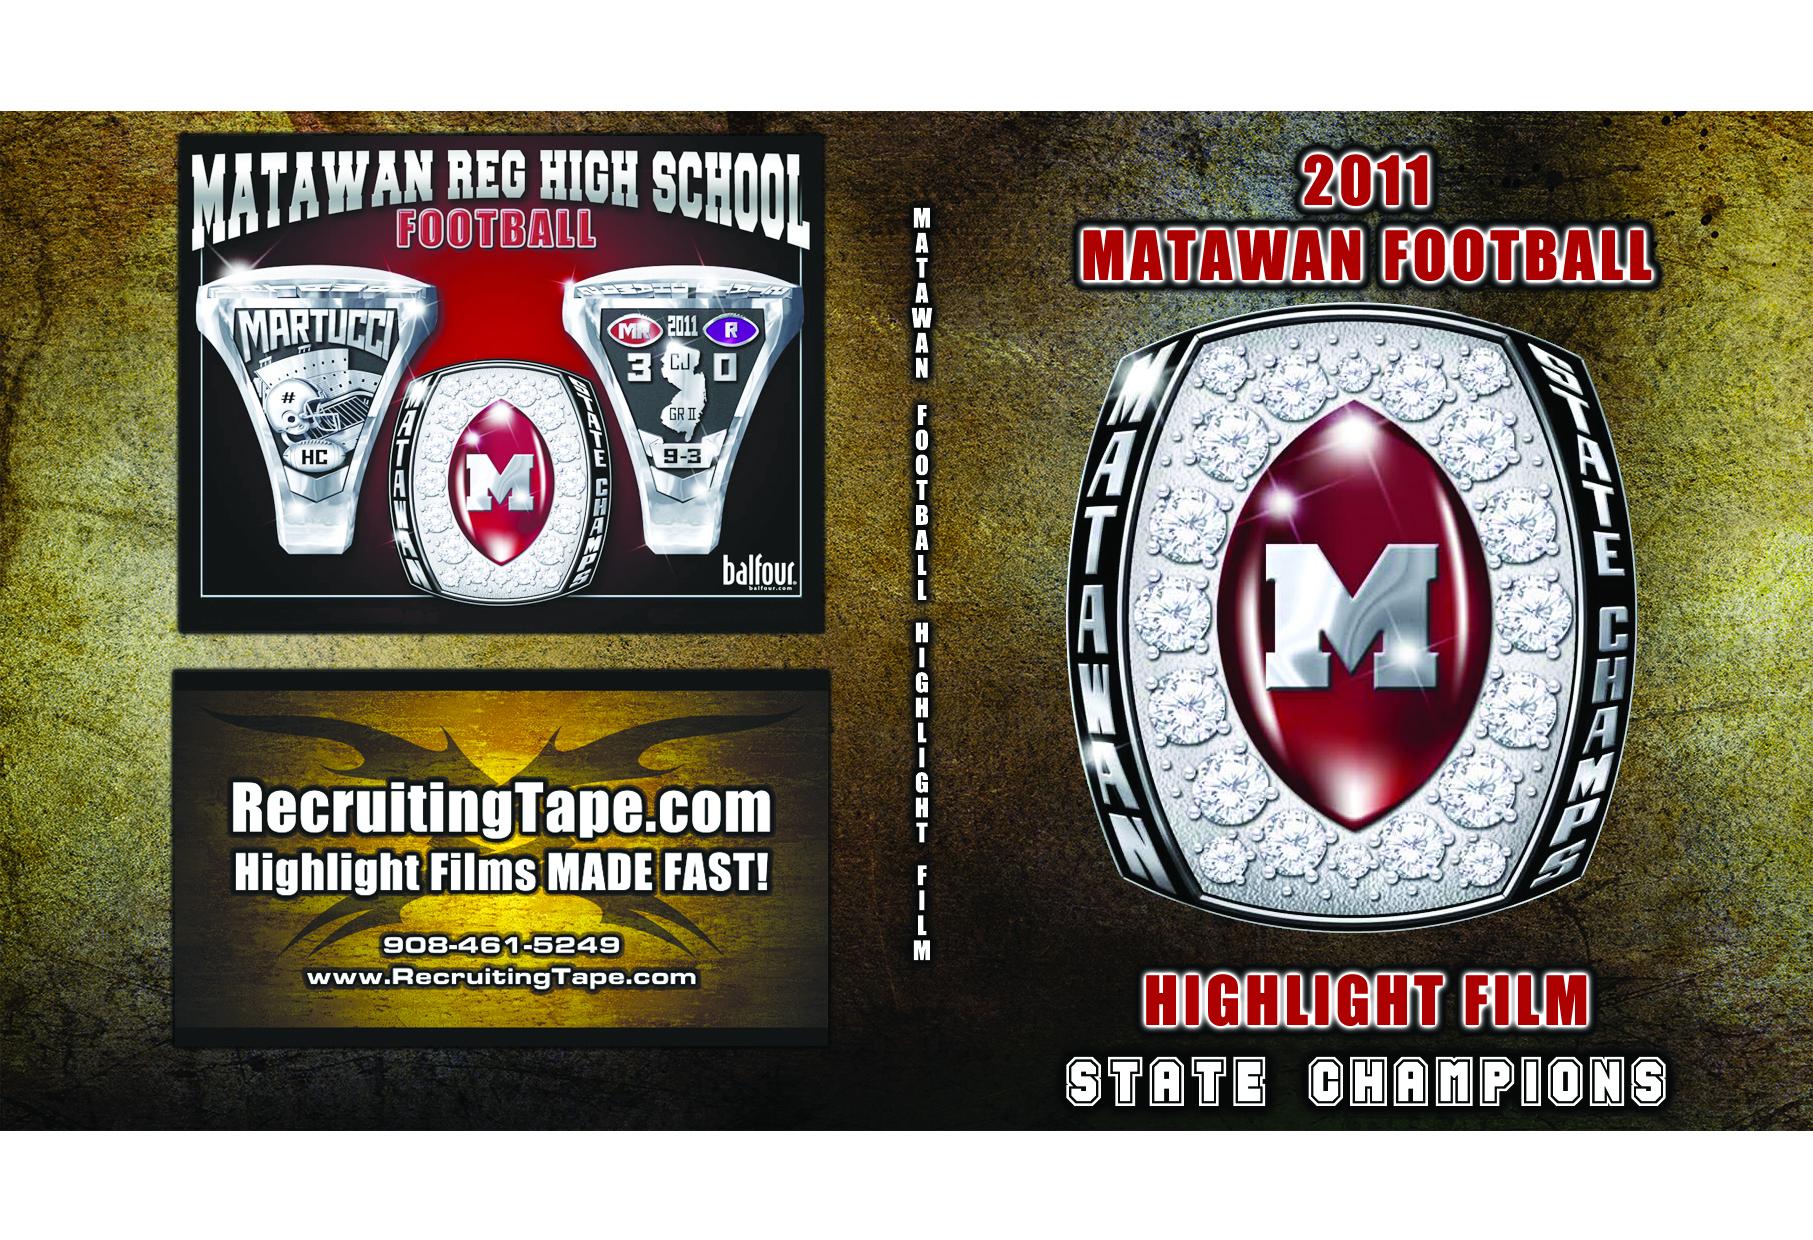 2011 Matawan Highlight Film Football Jacket for graphic.jpg